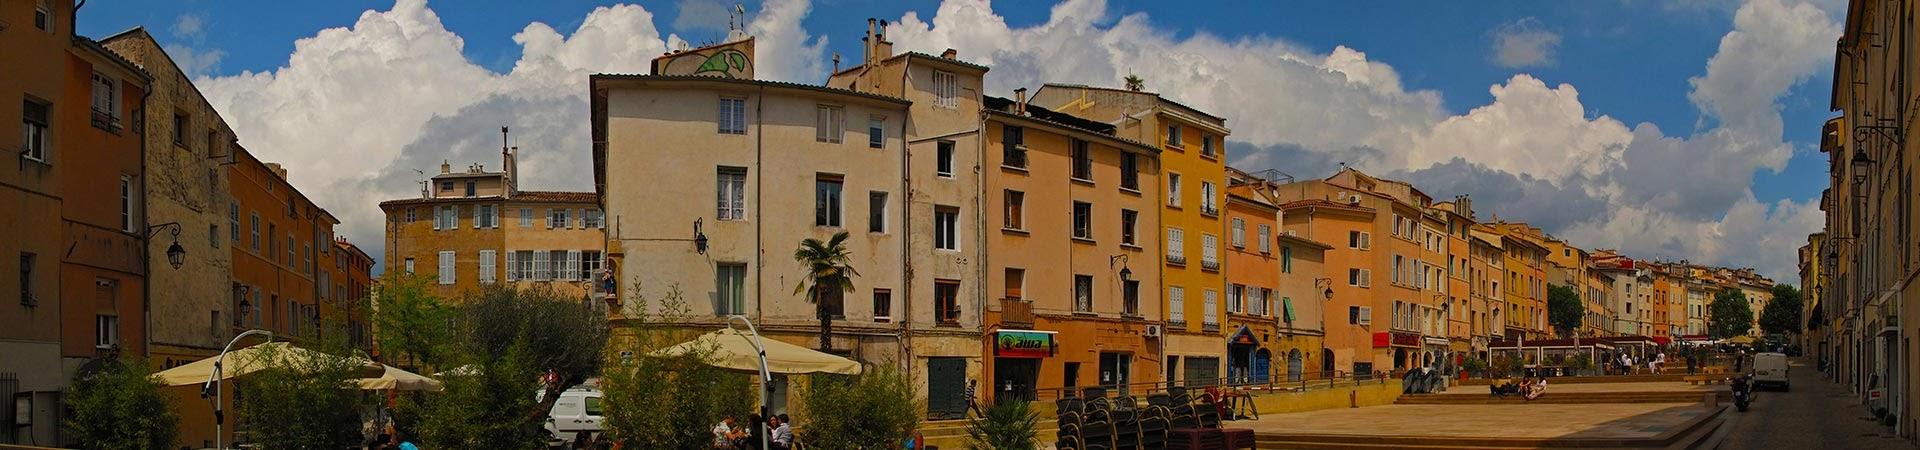 Immobilier Aix-en-Provence